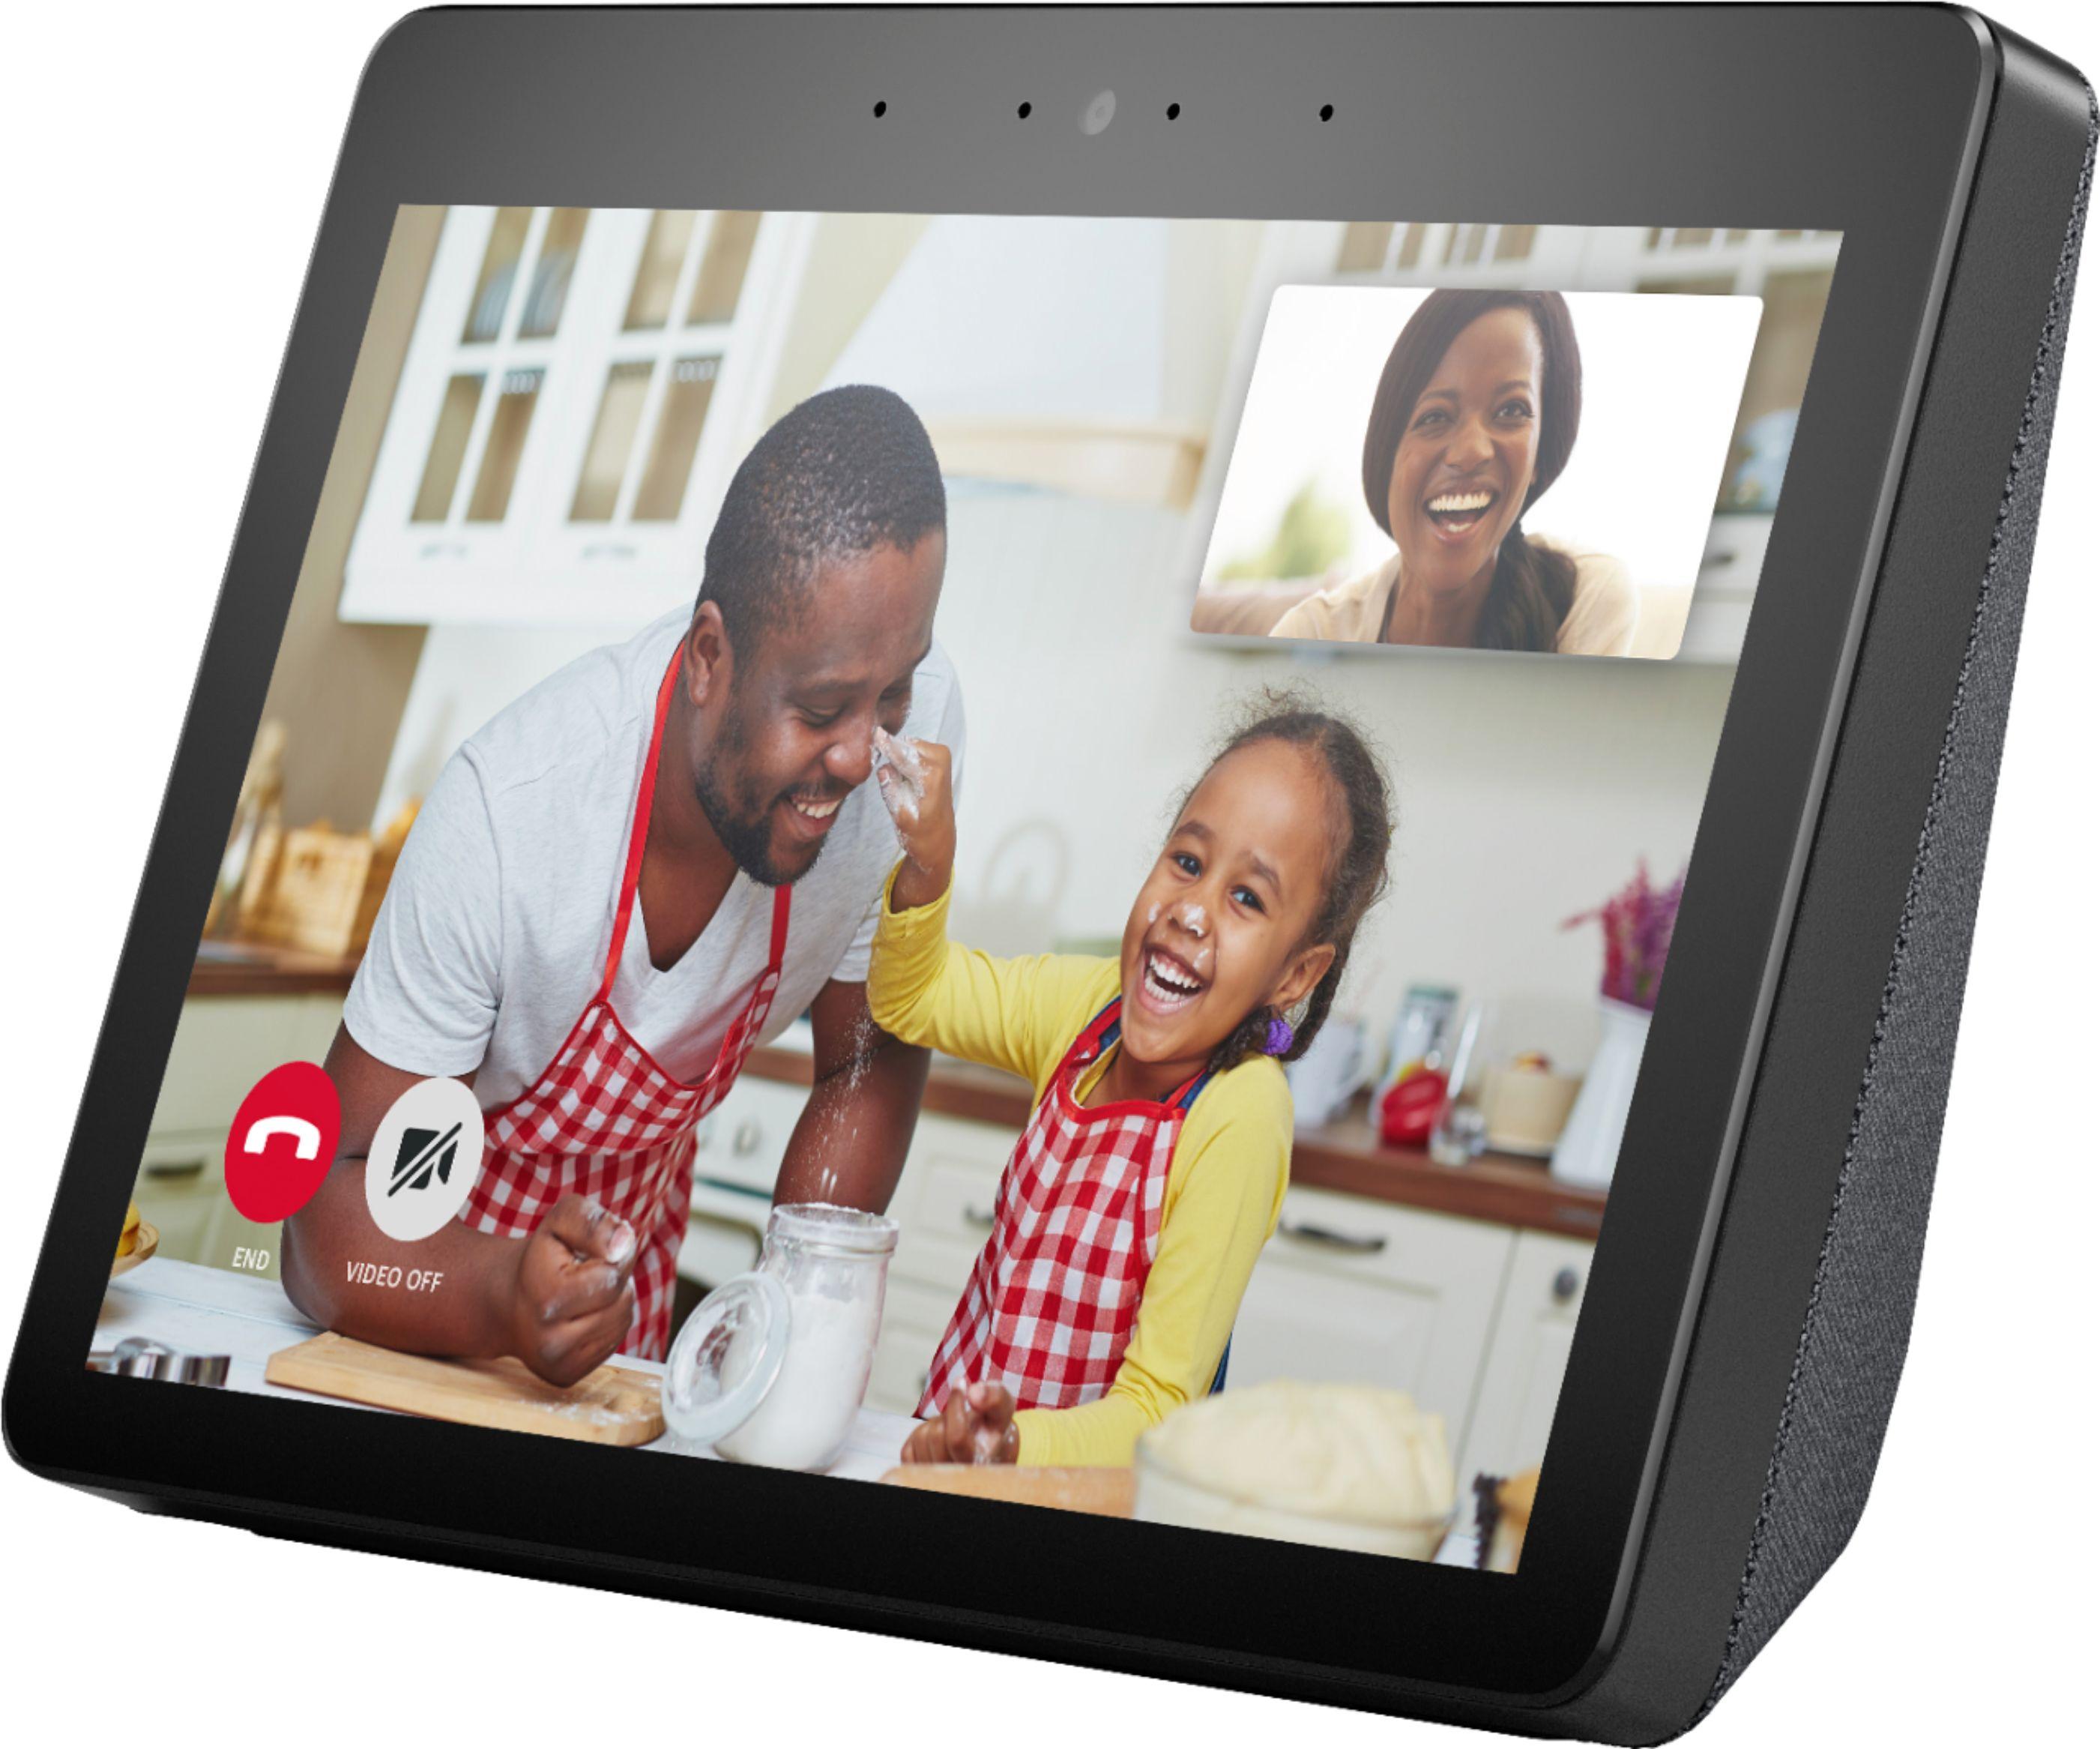 Amazon Echo Show (2nd Gen) w/ Free Echo Dot and White Philips Hue A19 Bulb $159.99